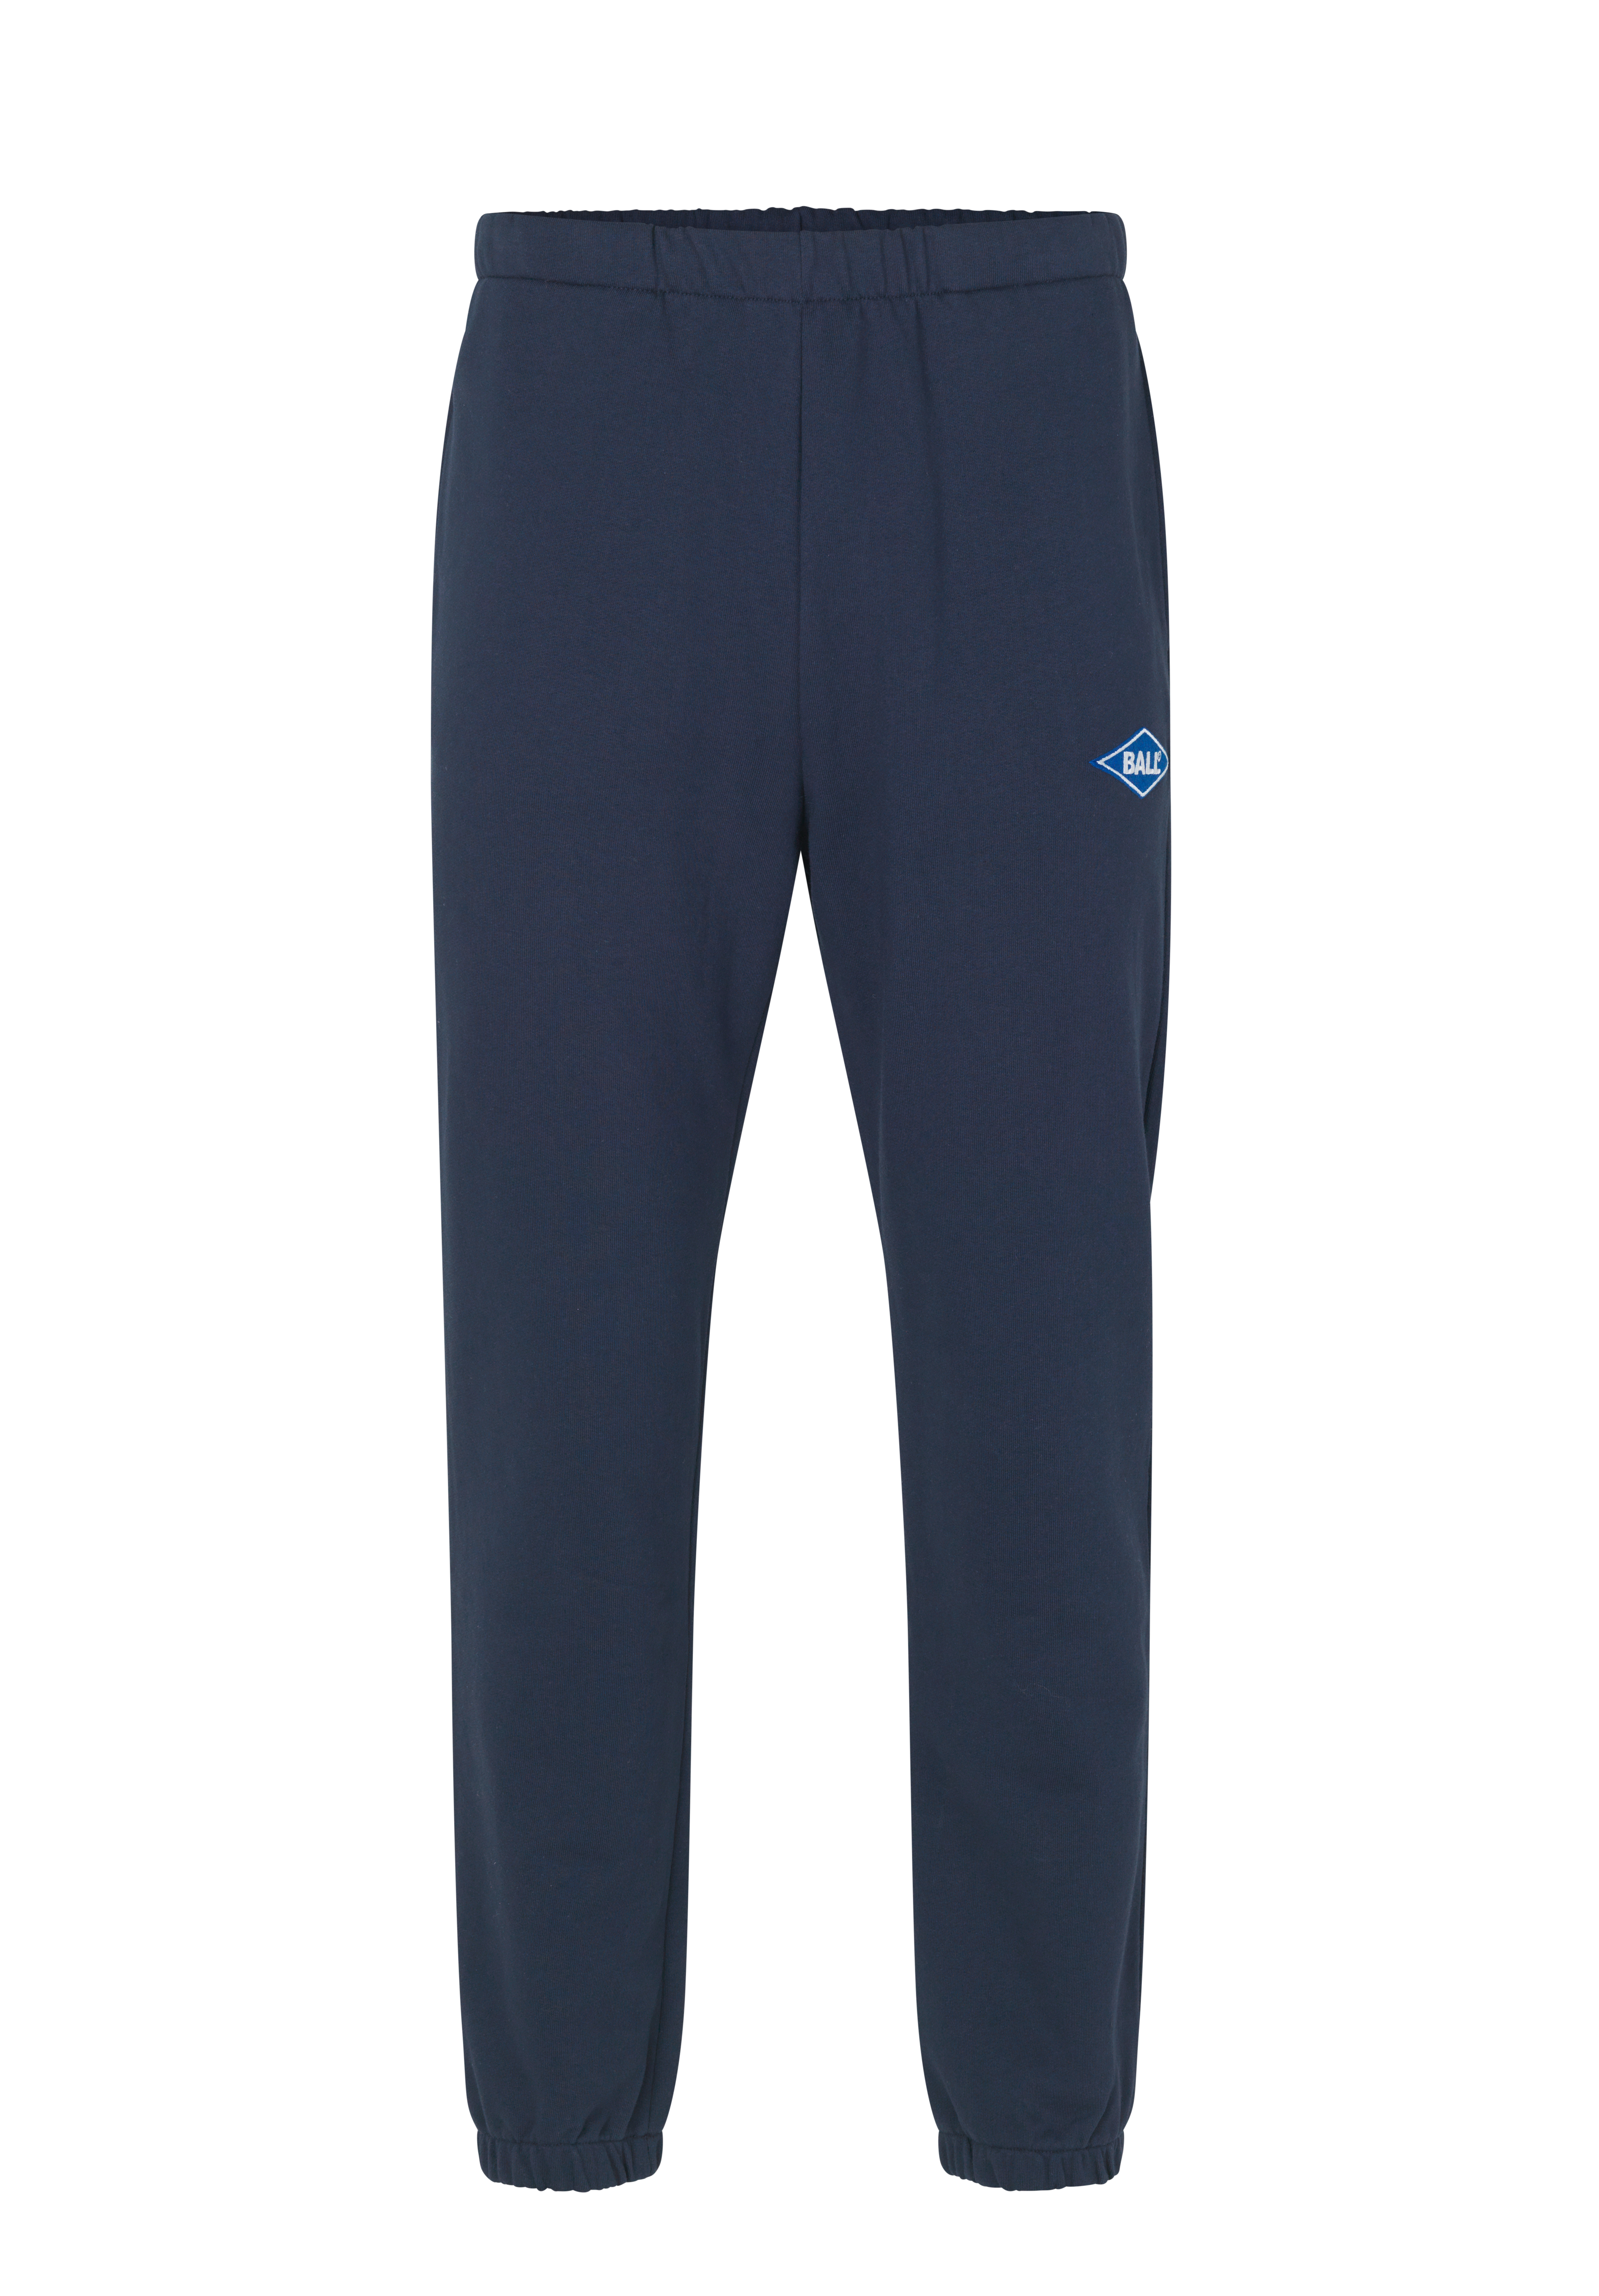 BALL Original Rimini sweatpants, navy, x-large